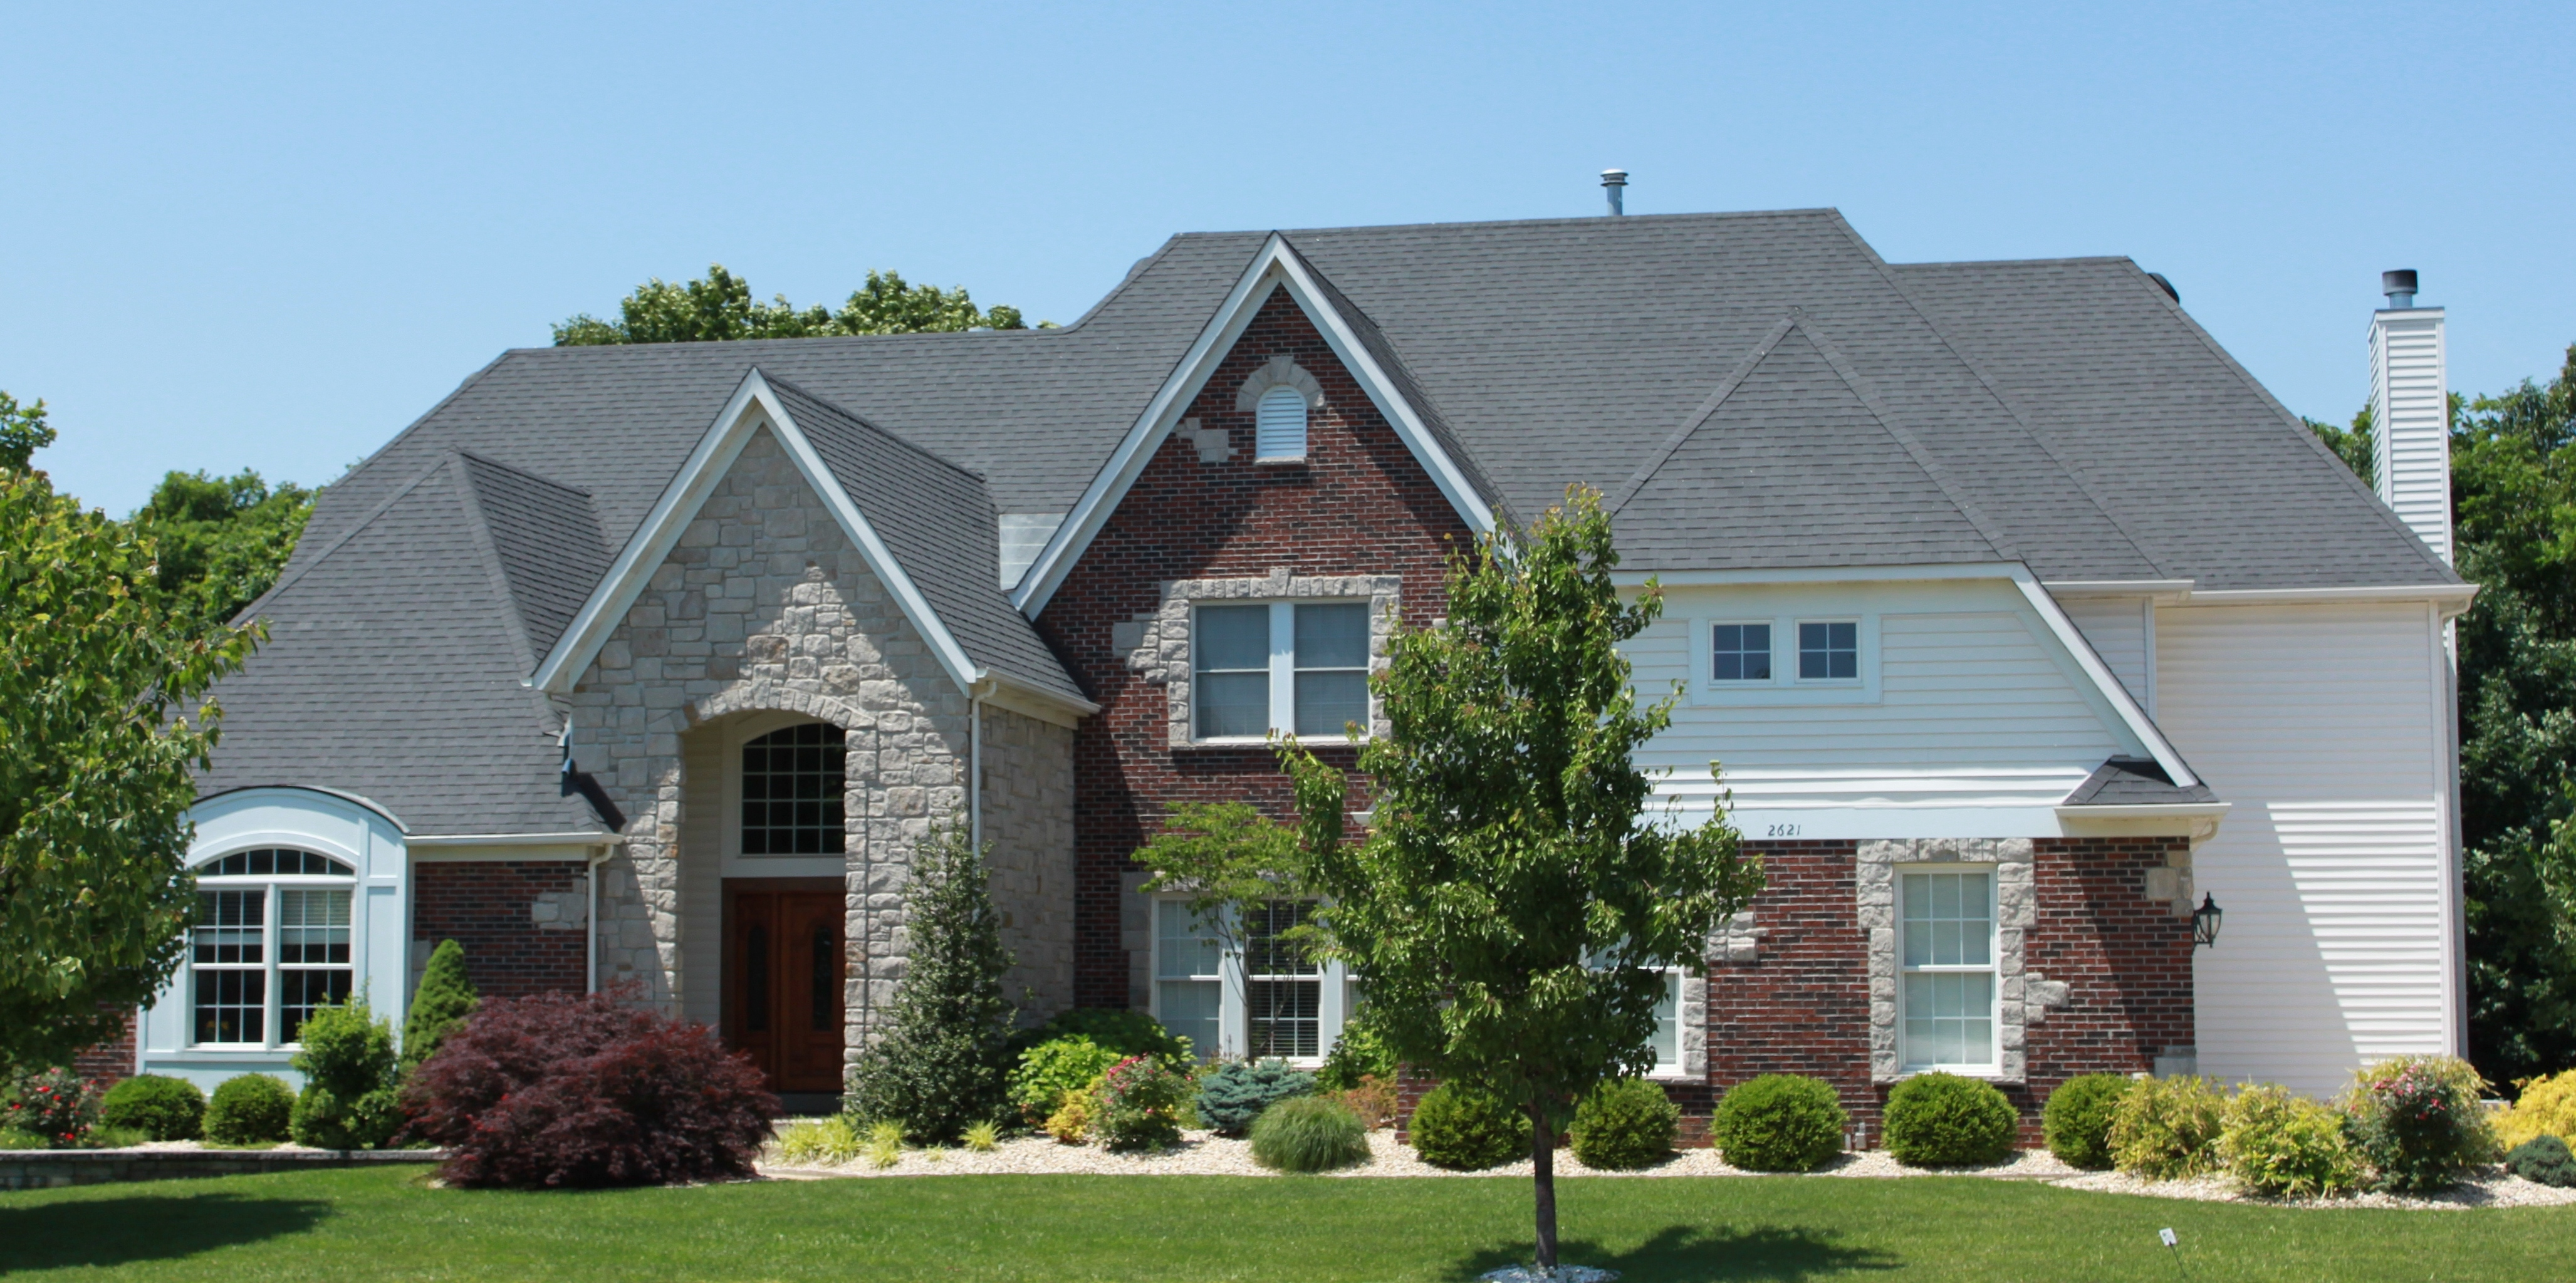 roof repair chesterfield and wildwood 63005